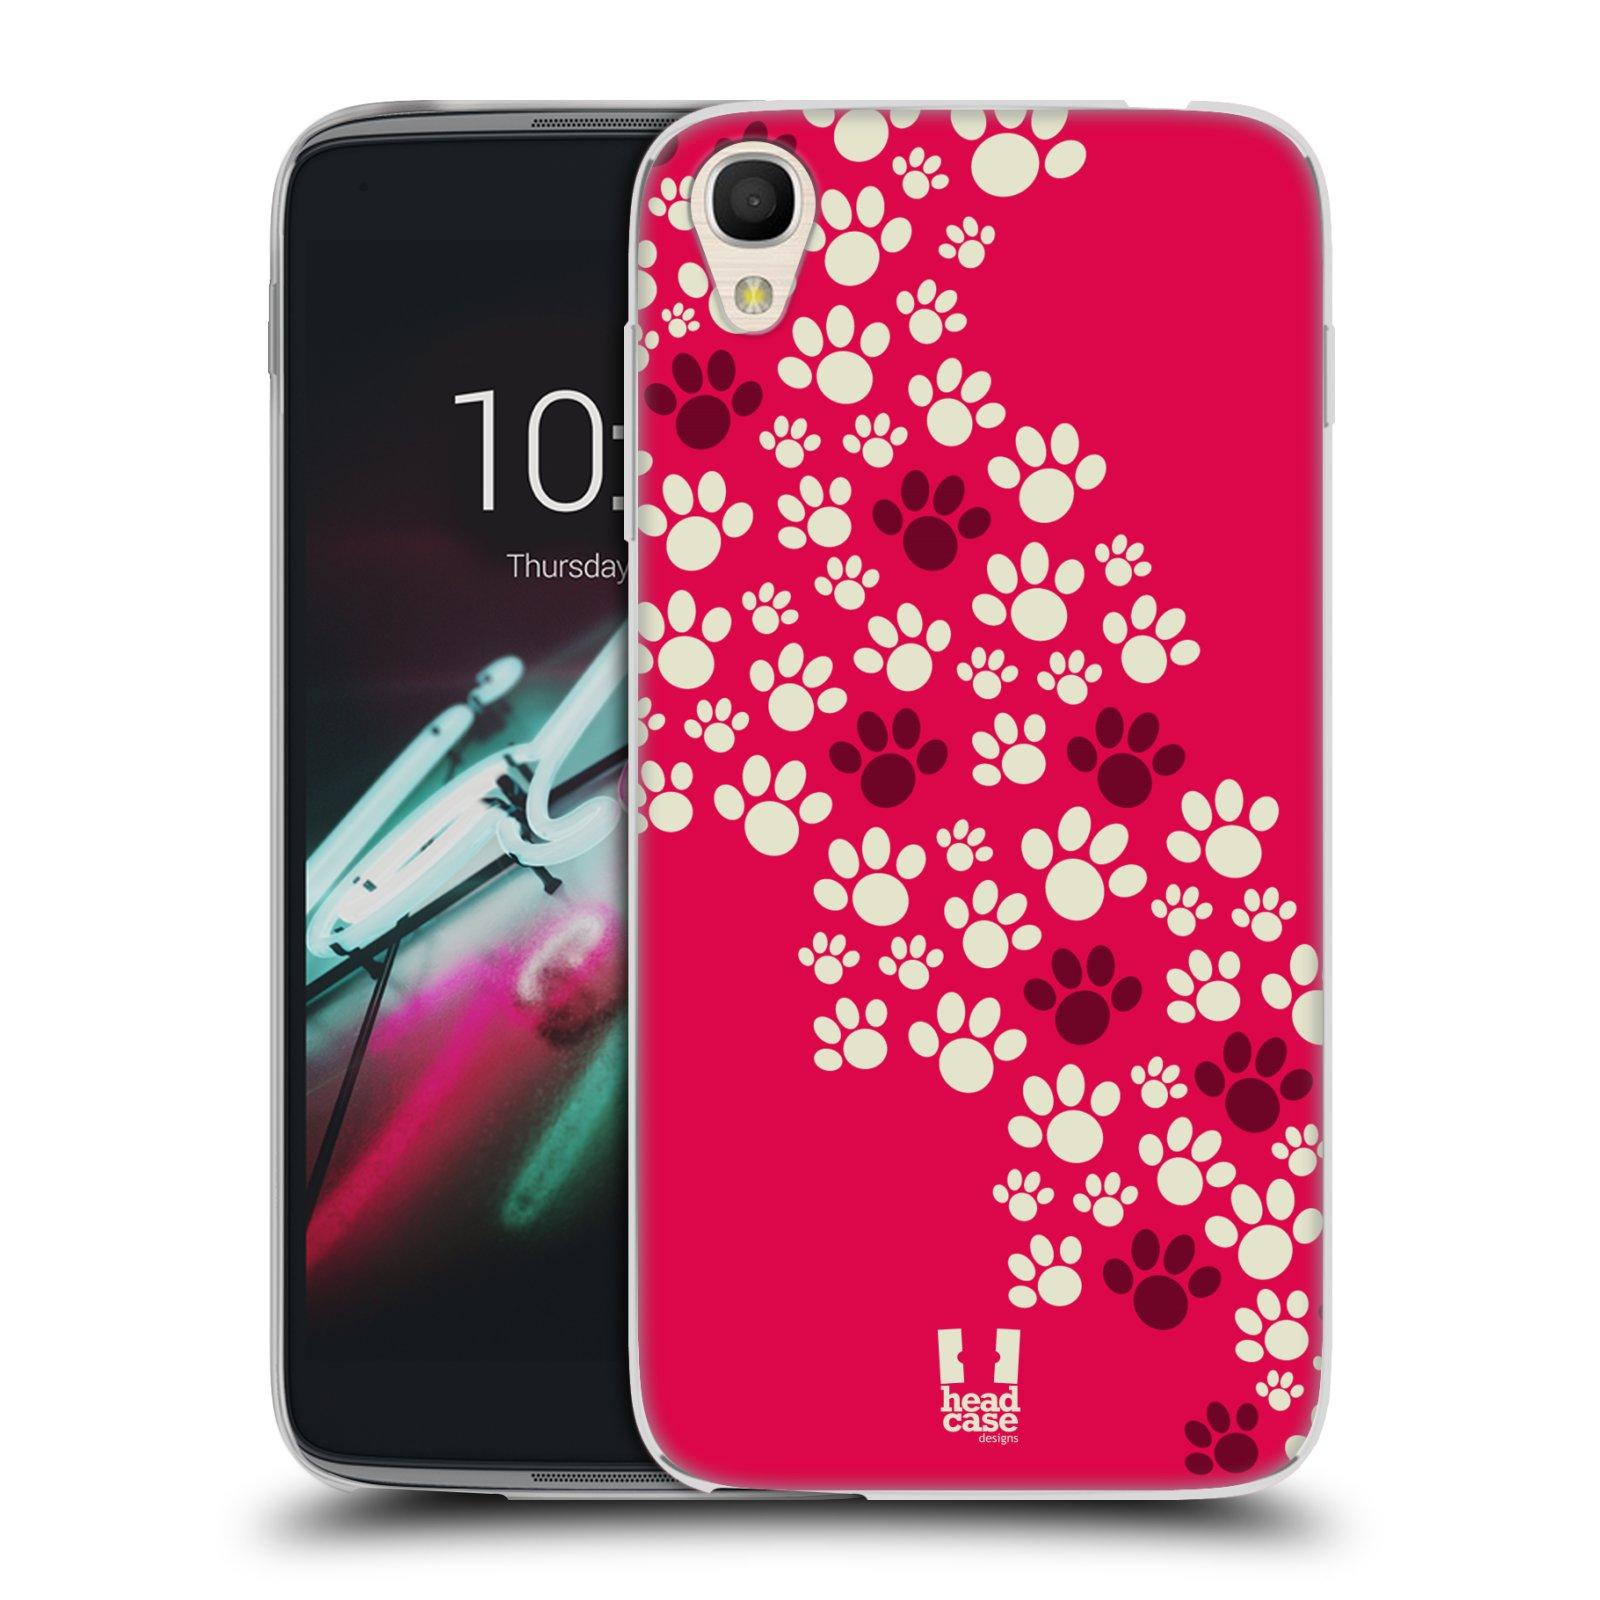 "Silikonové pouzdro na mobil Alcatel One Touch 6039Y Idol 3 HEAD CASE TLAPKY RŮŽOVÉ (Silikonový kryt či obal na mobilní telefon Alcatel One Touch Idol 3 OT-6039Y s 4,7"" displejem)"